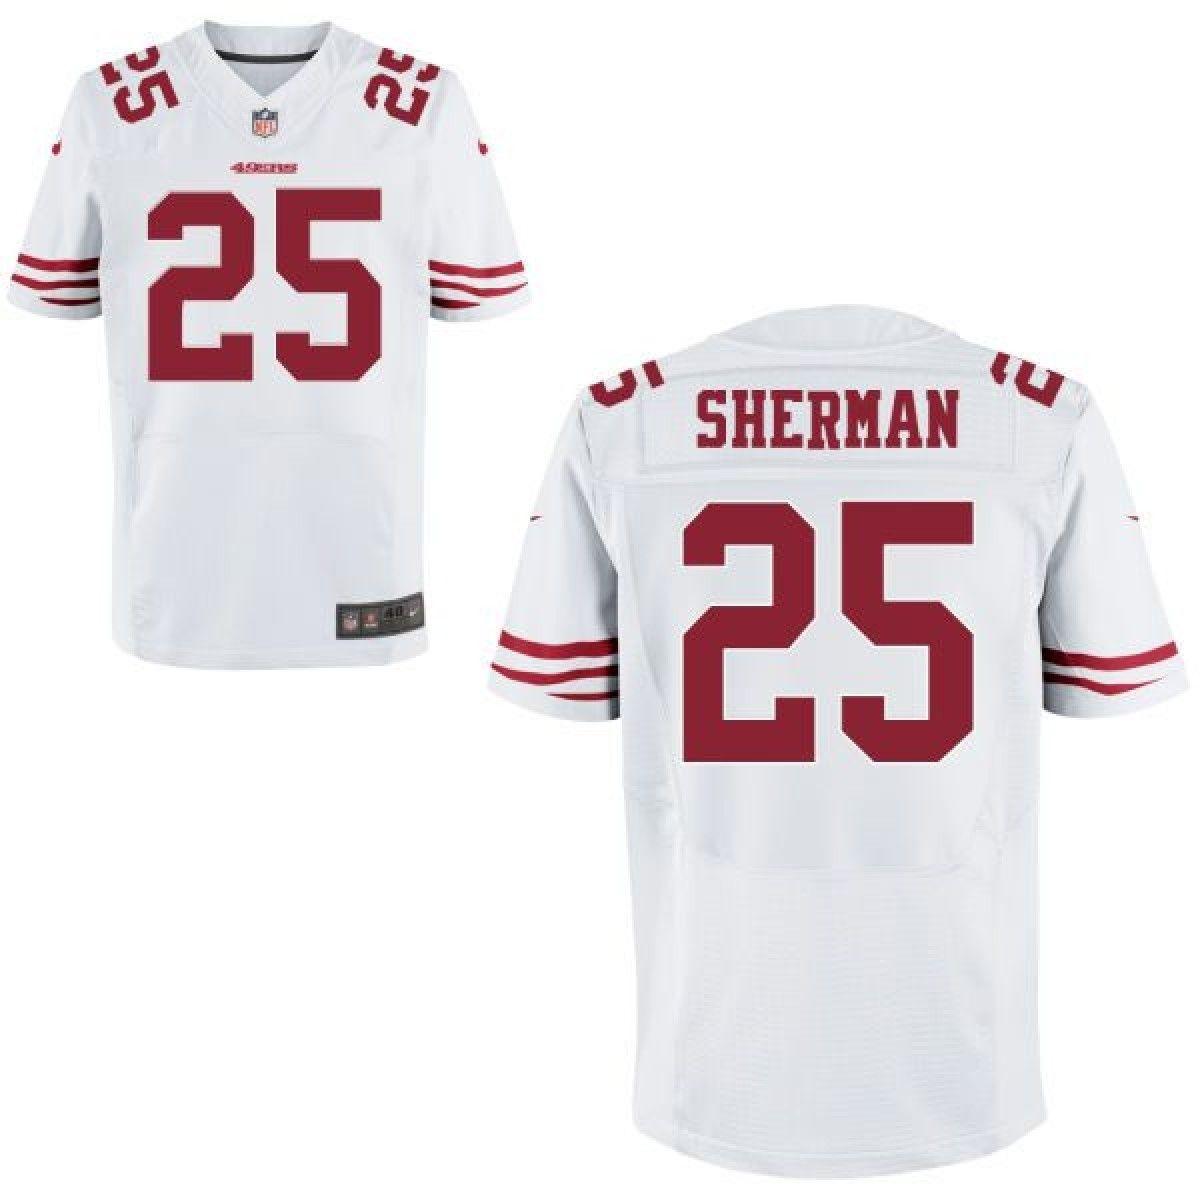 new style 9e250 f04b5 Men's San Francisco 49ers #25 Richard Sherman Elite White ...